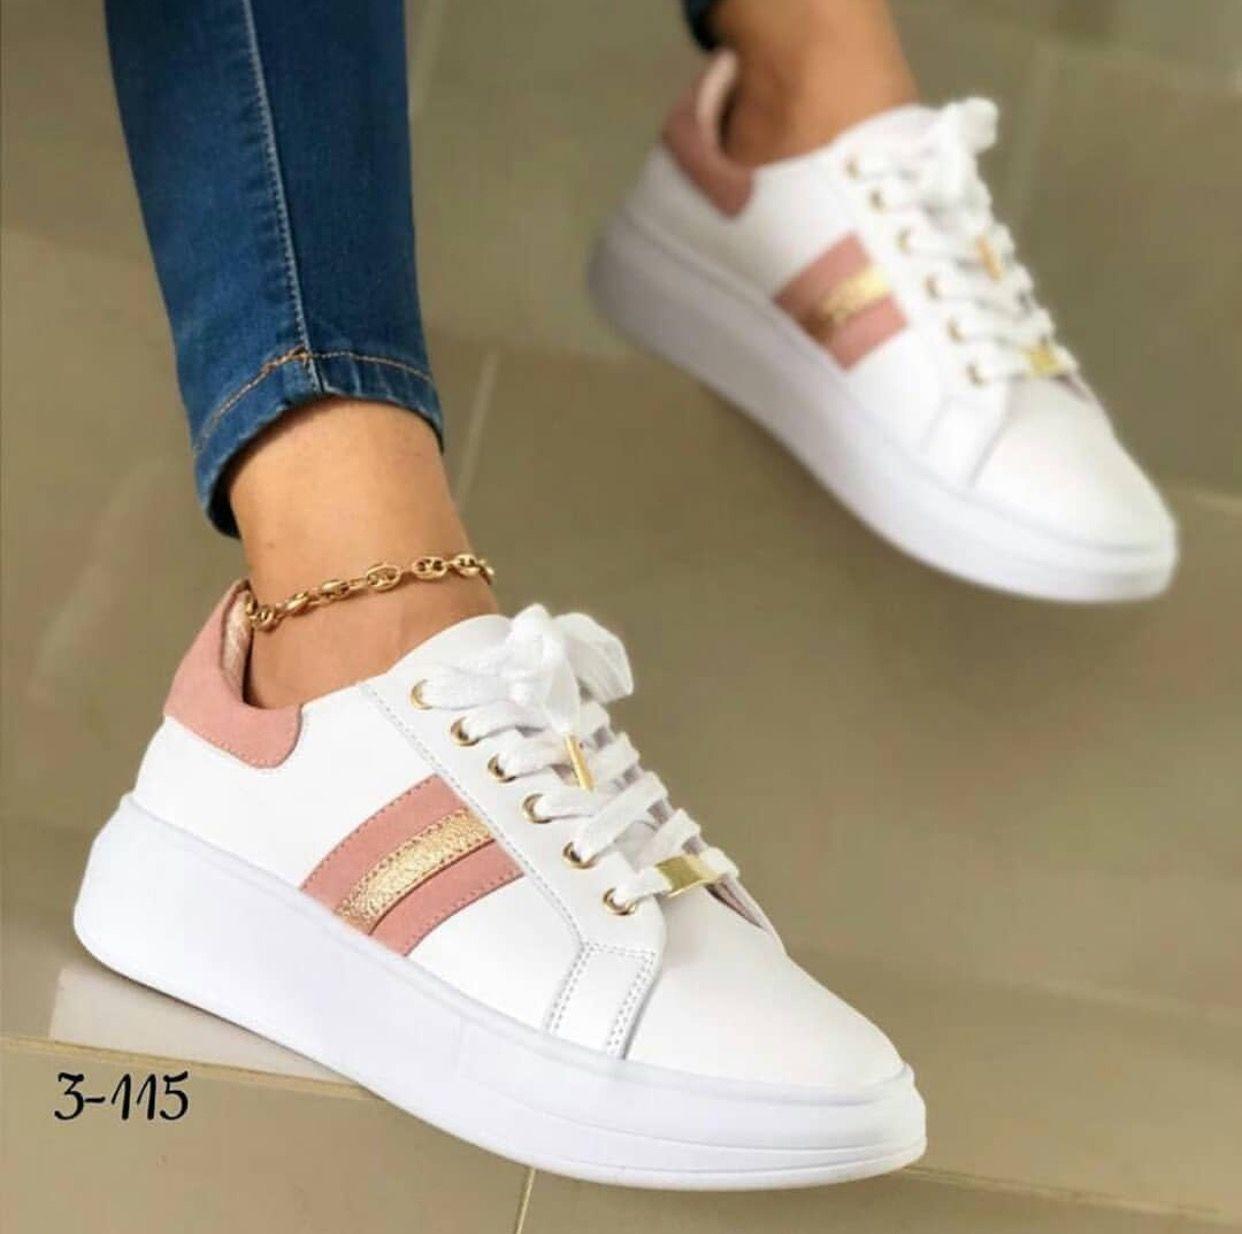 Girls sneakers, Girls sneakers fashion